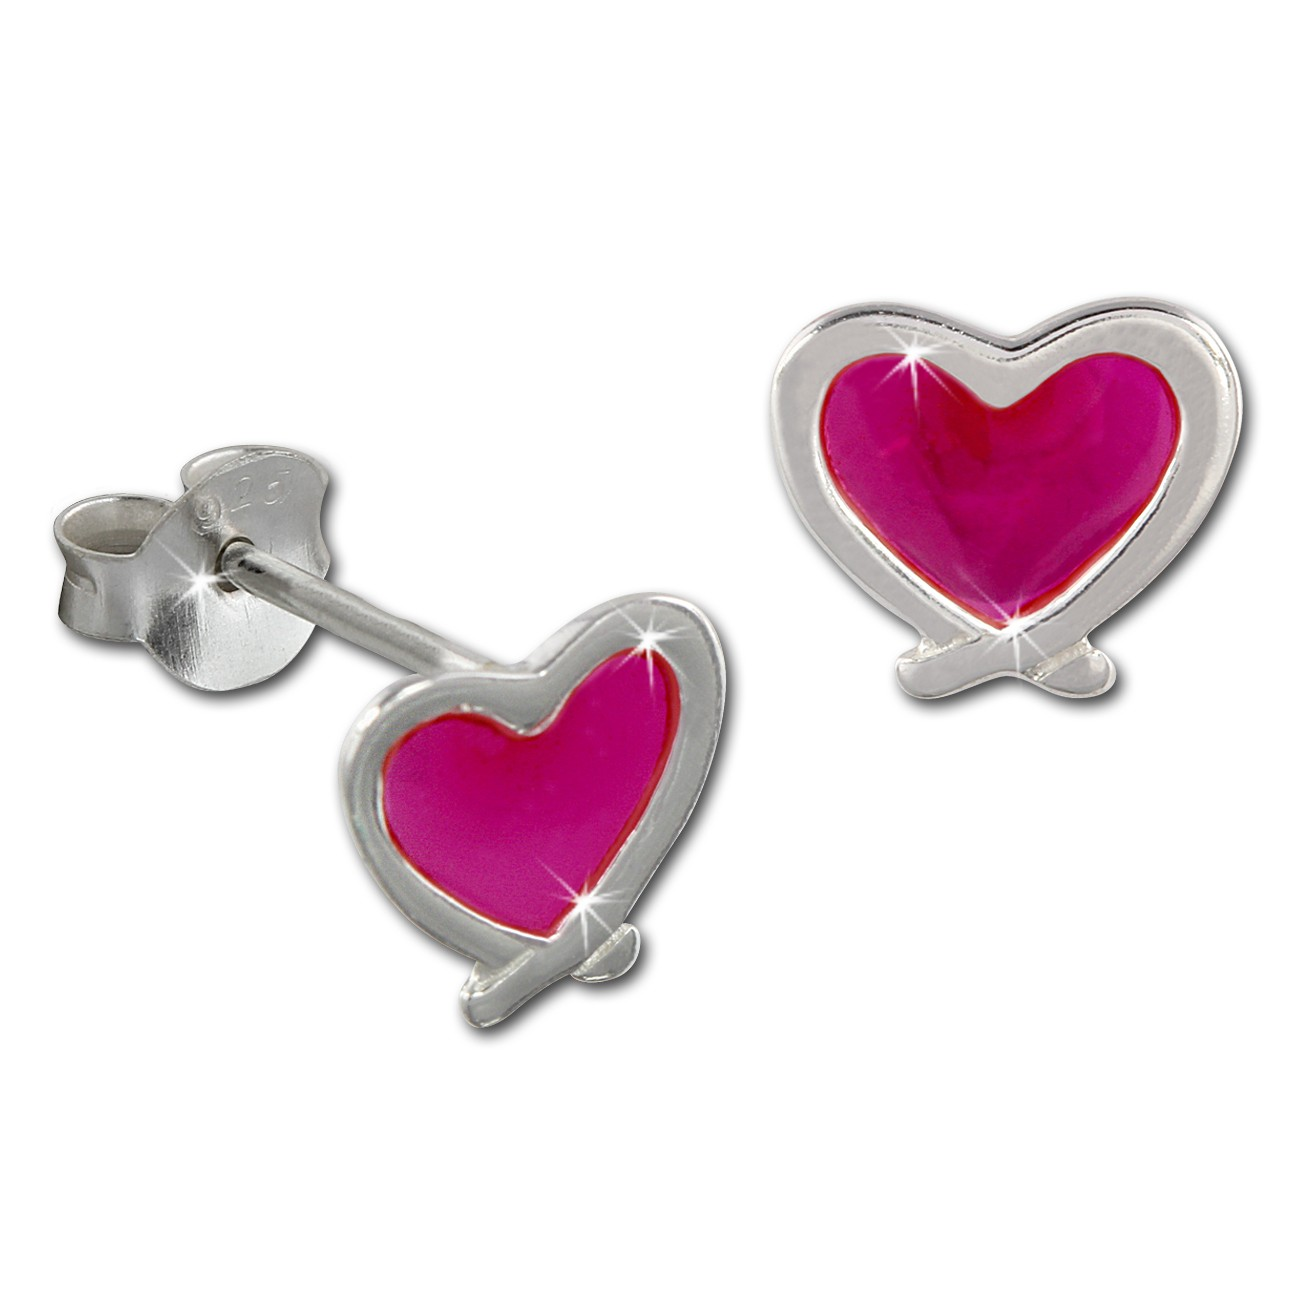 Kinder Ohrring Herz pink Silber Ohrstecker Kinderschmuck TW SDO8120P